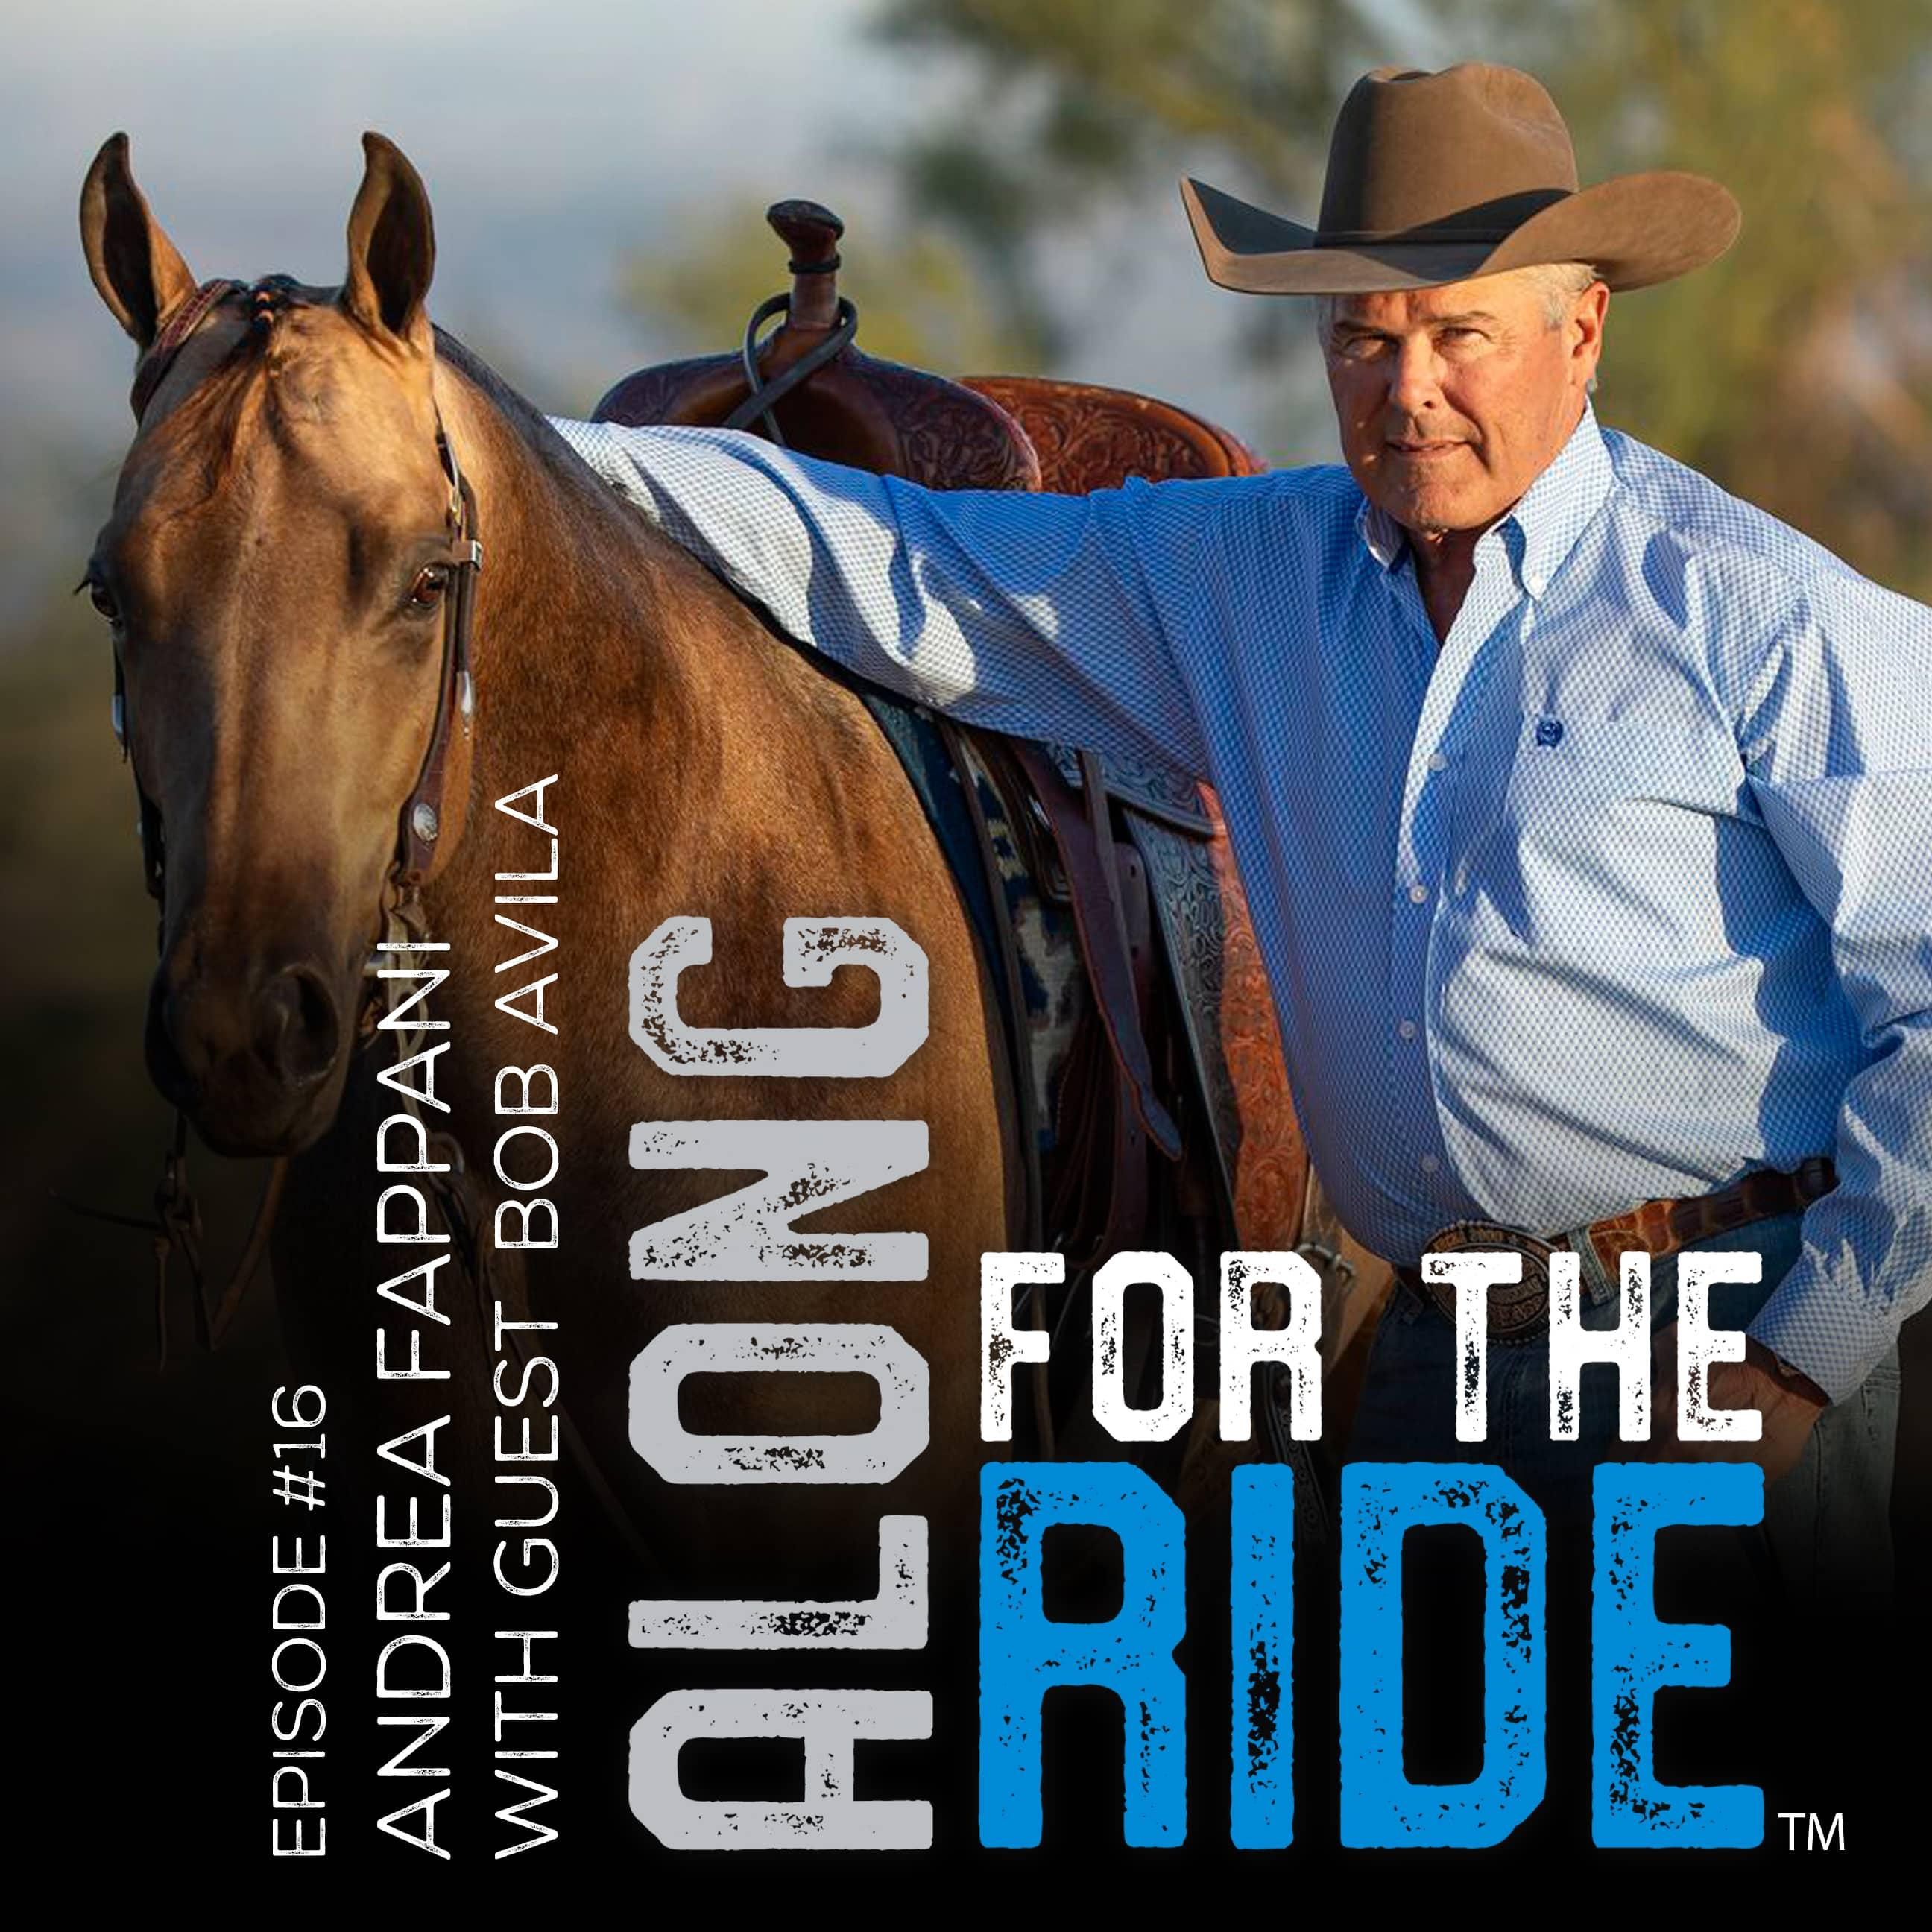 Bob Avila Along For The Ride™